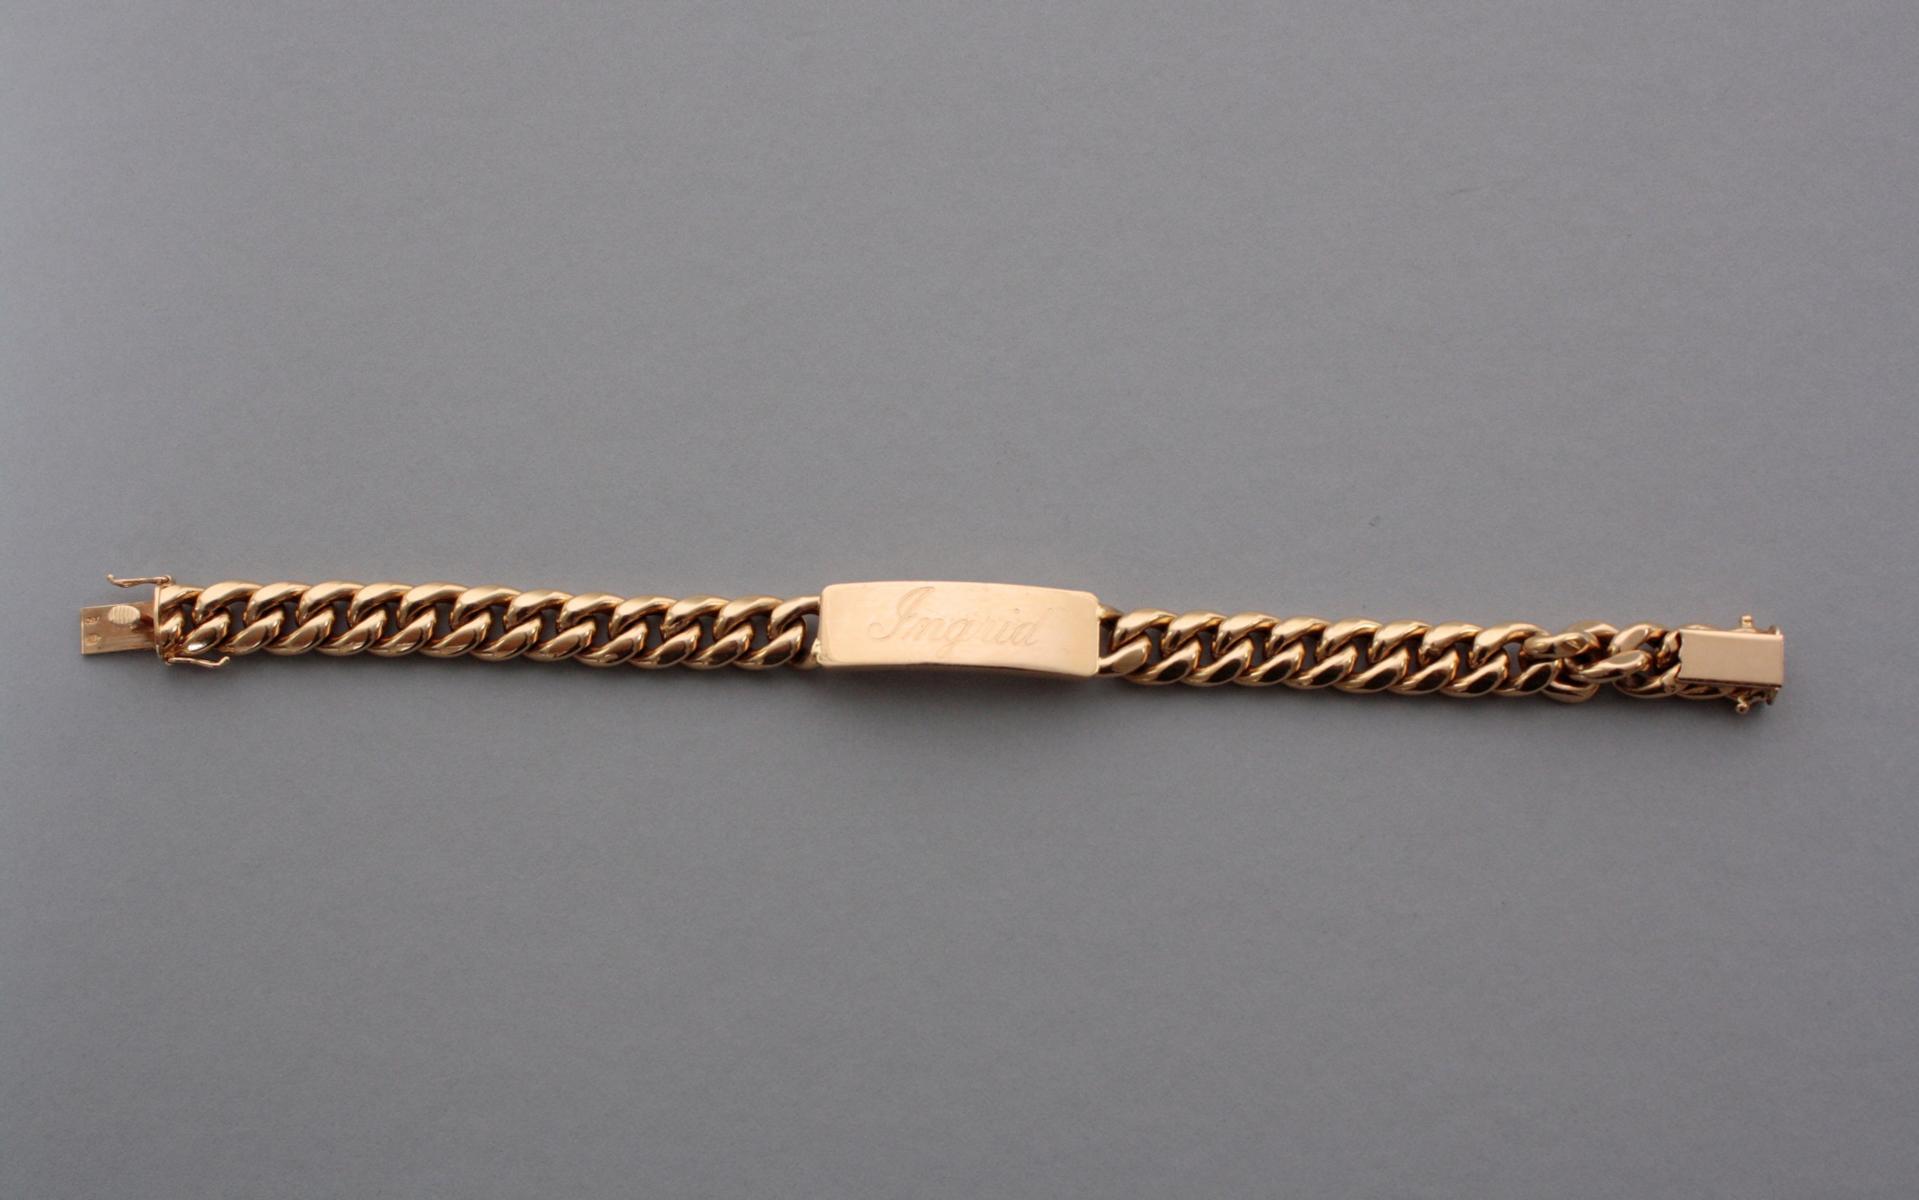 Armband mit Gravur, 18 Karat Gelbgold